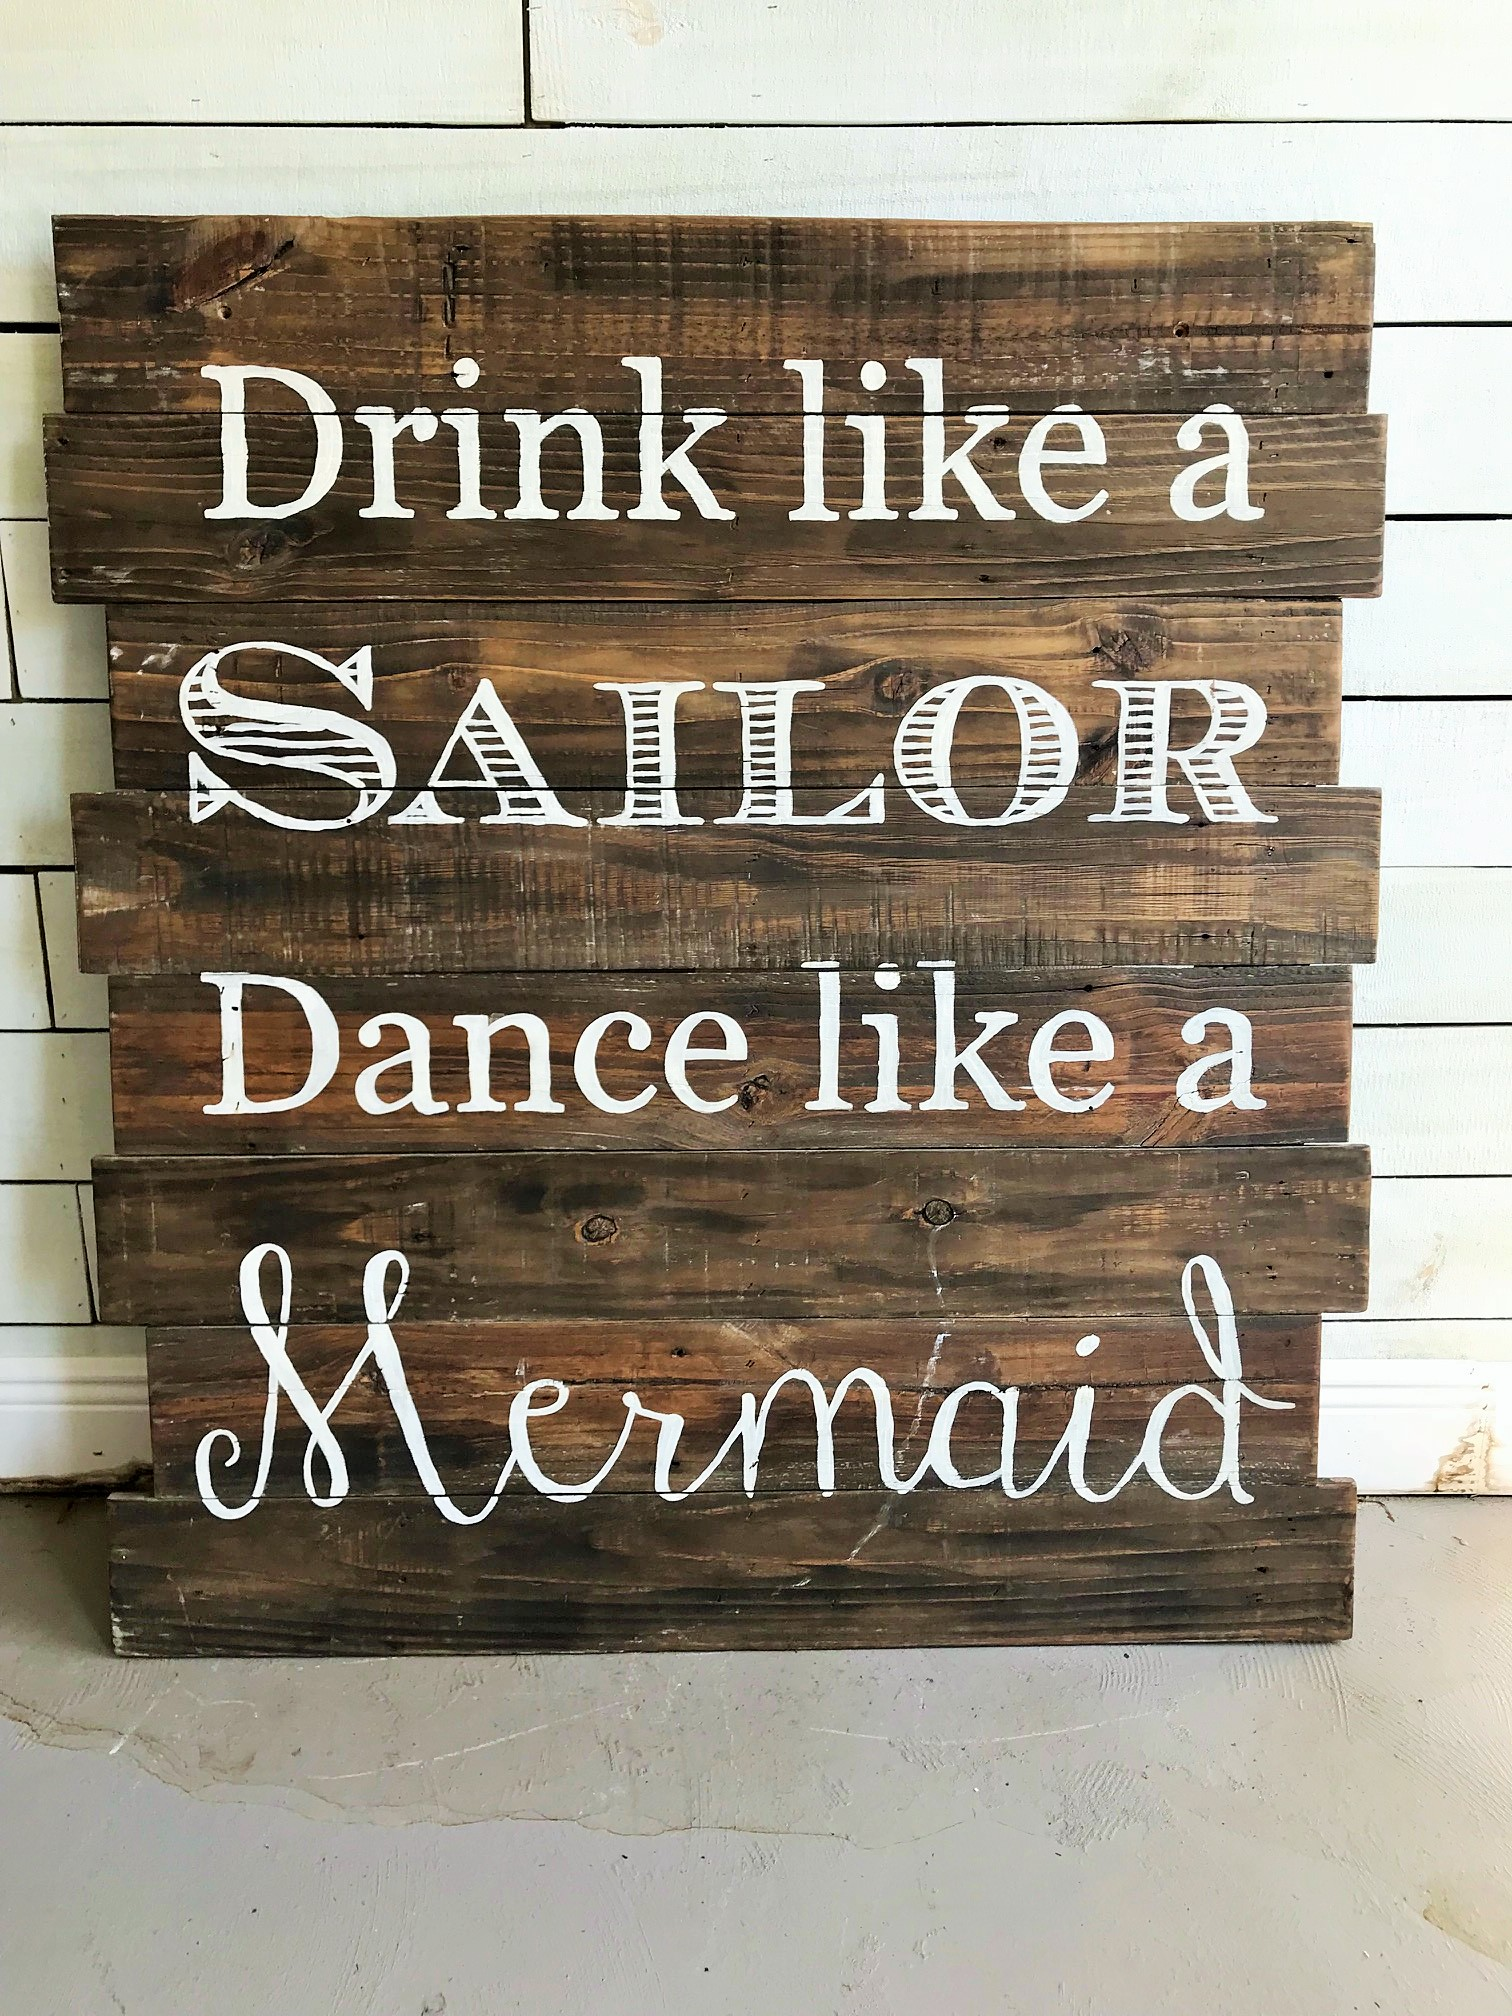 Drink like a Sailor Dance like a Mermaid